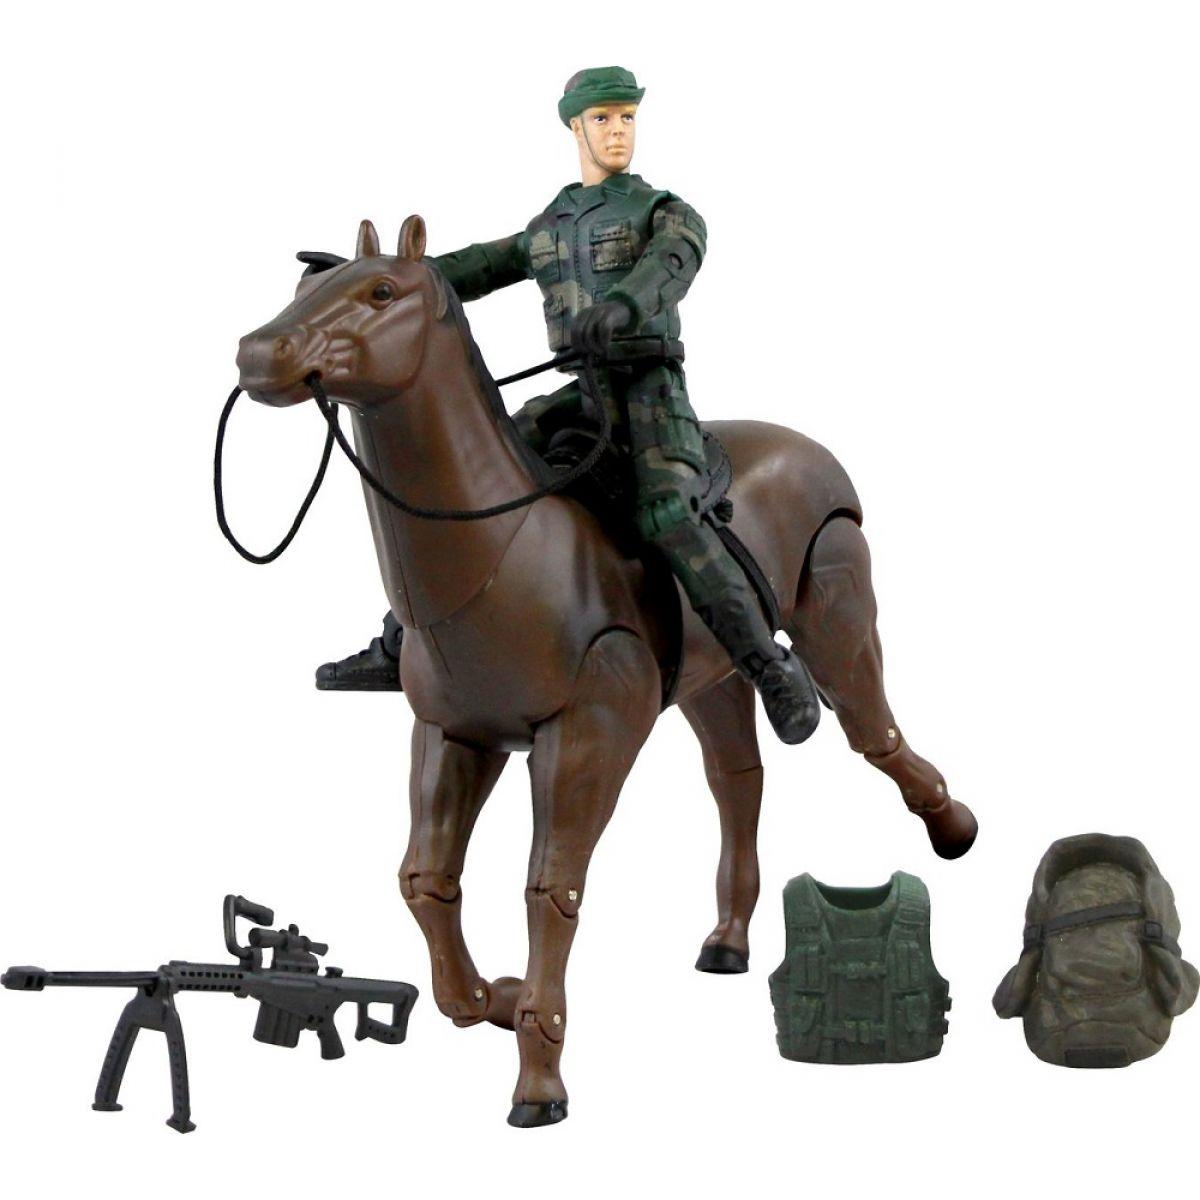 World Peacekeepers vojáka s doplňky Voják na koni